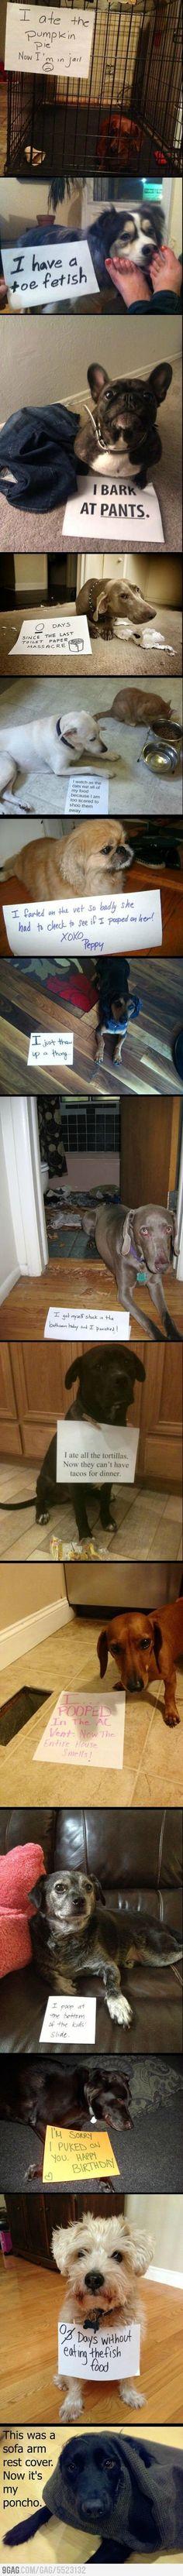 Bad dogs being bad. Damn near peed on myself LOL!